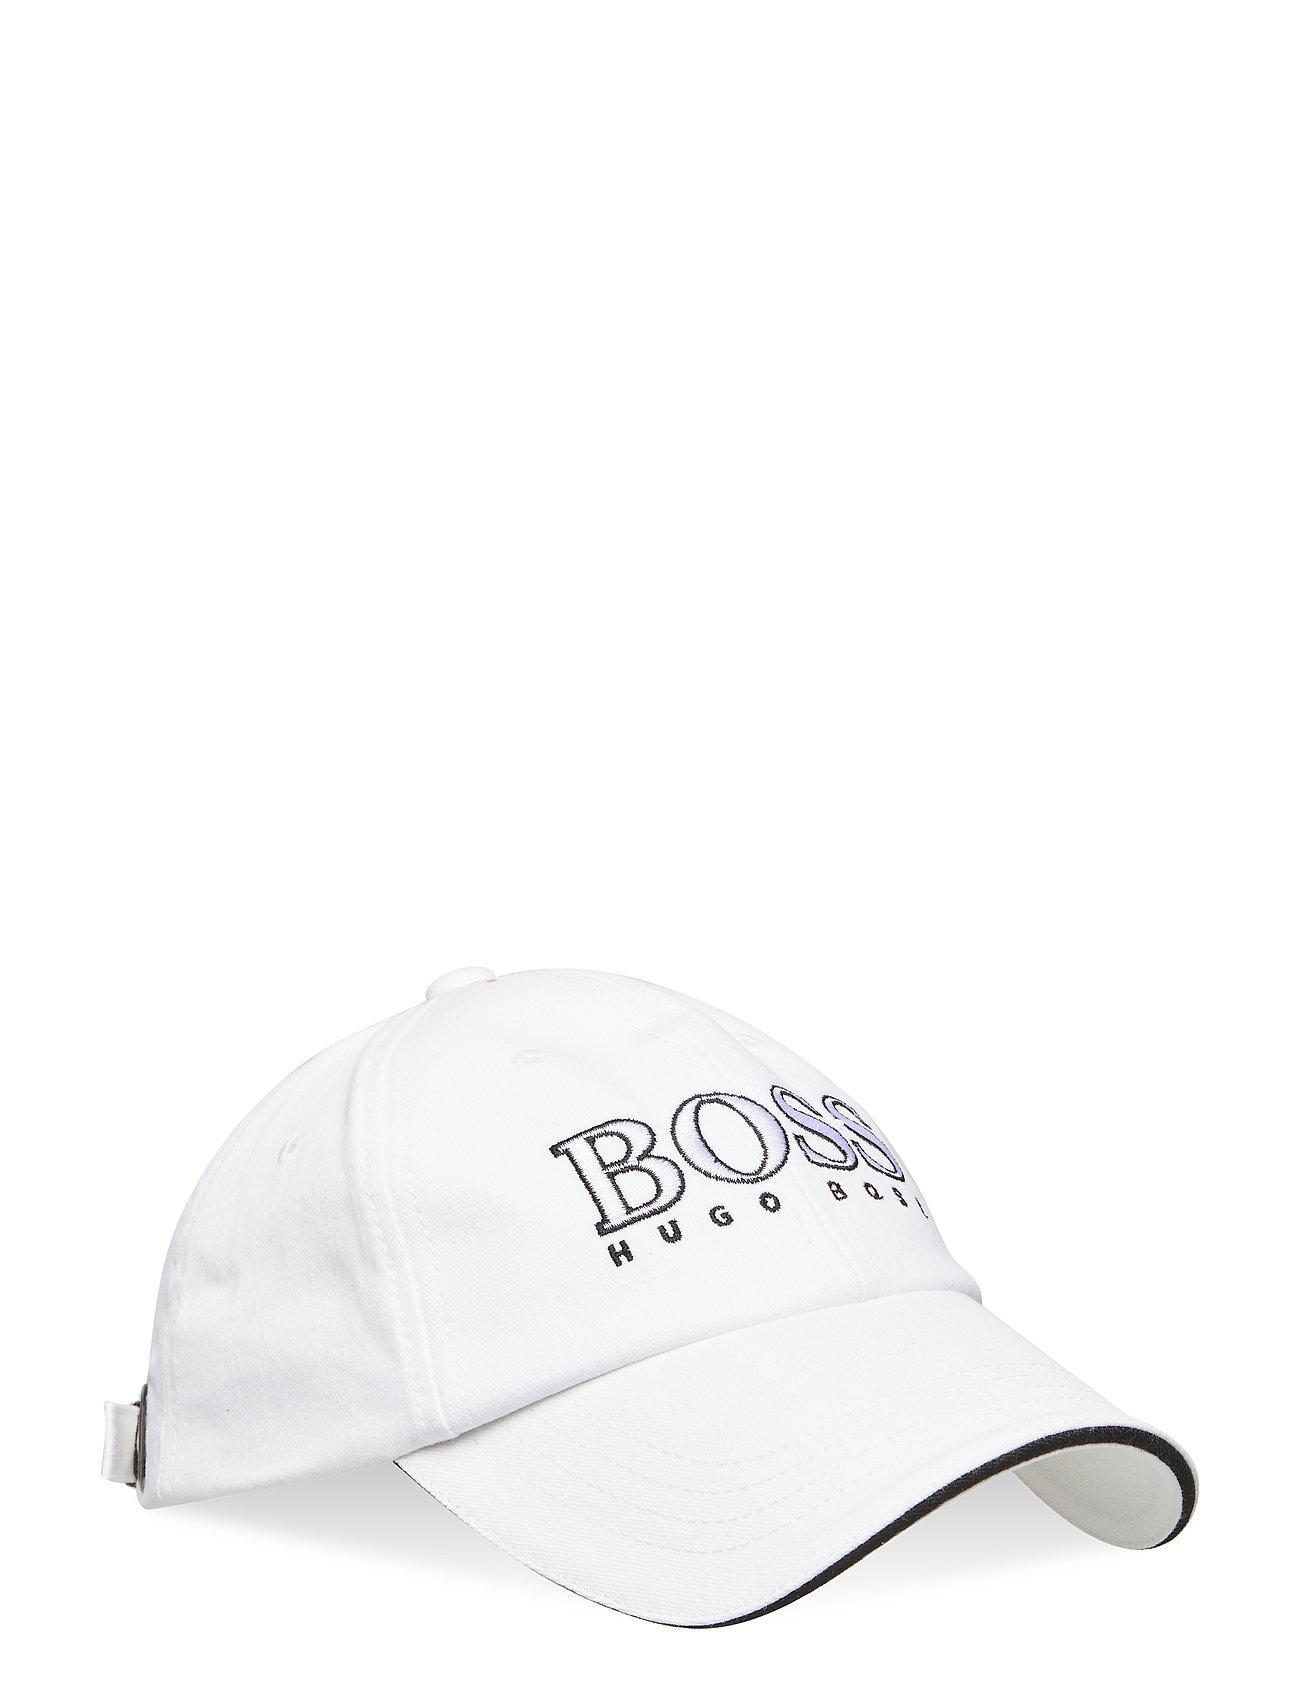 BOSS CAP - WHITE